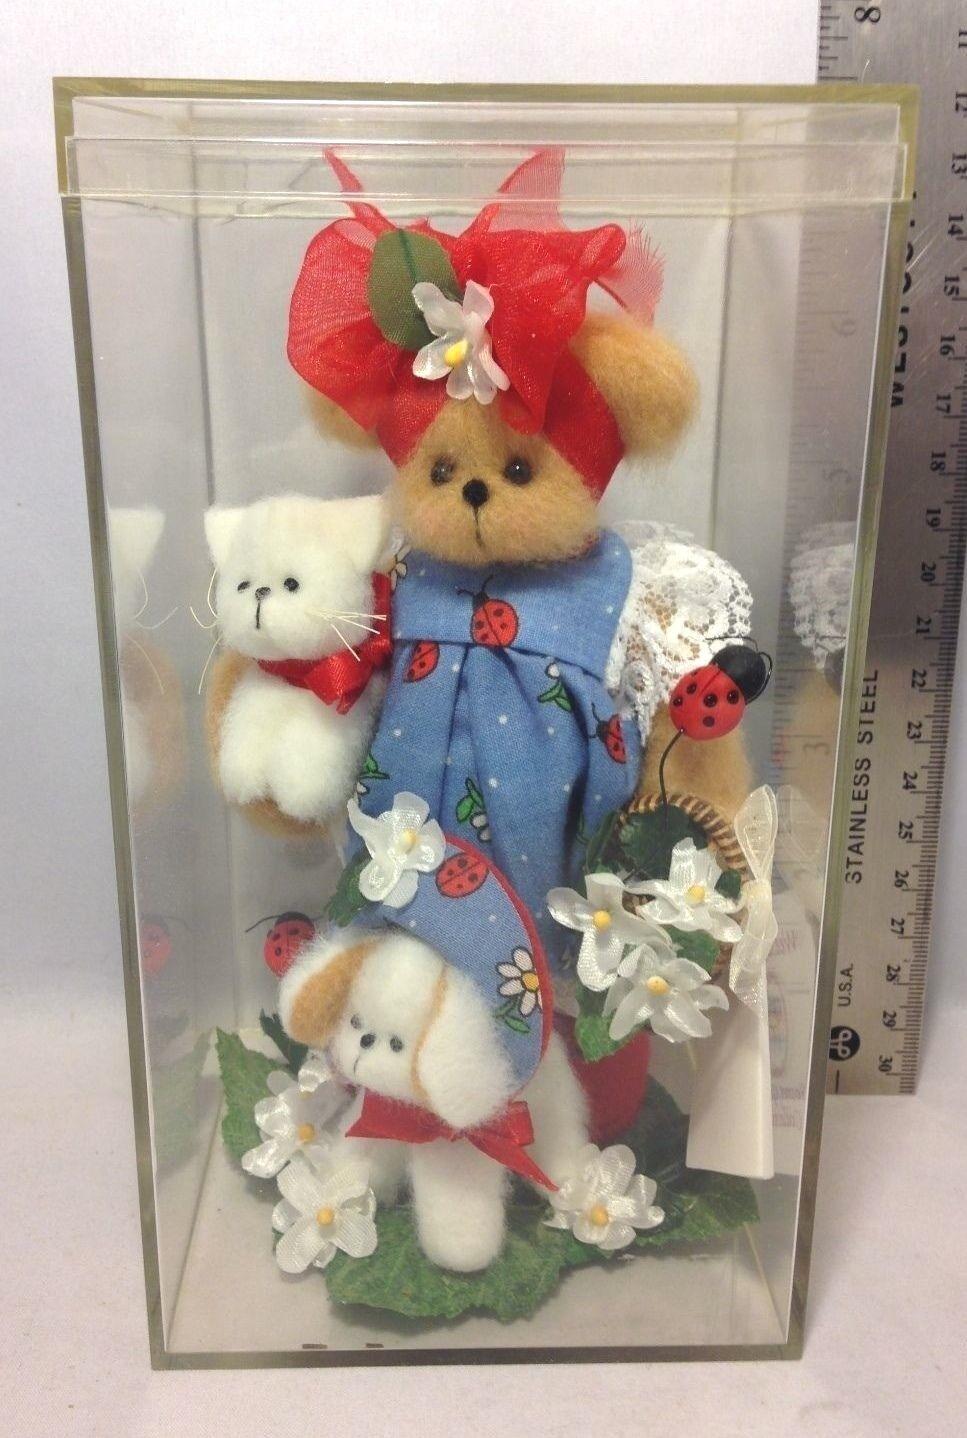 1 400 Wee B Bears Doll - Secret Garden Collection  Lacie & Ladybug Garden Club